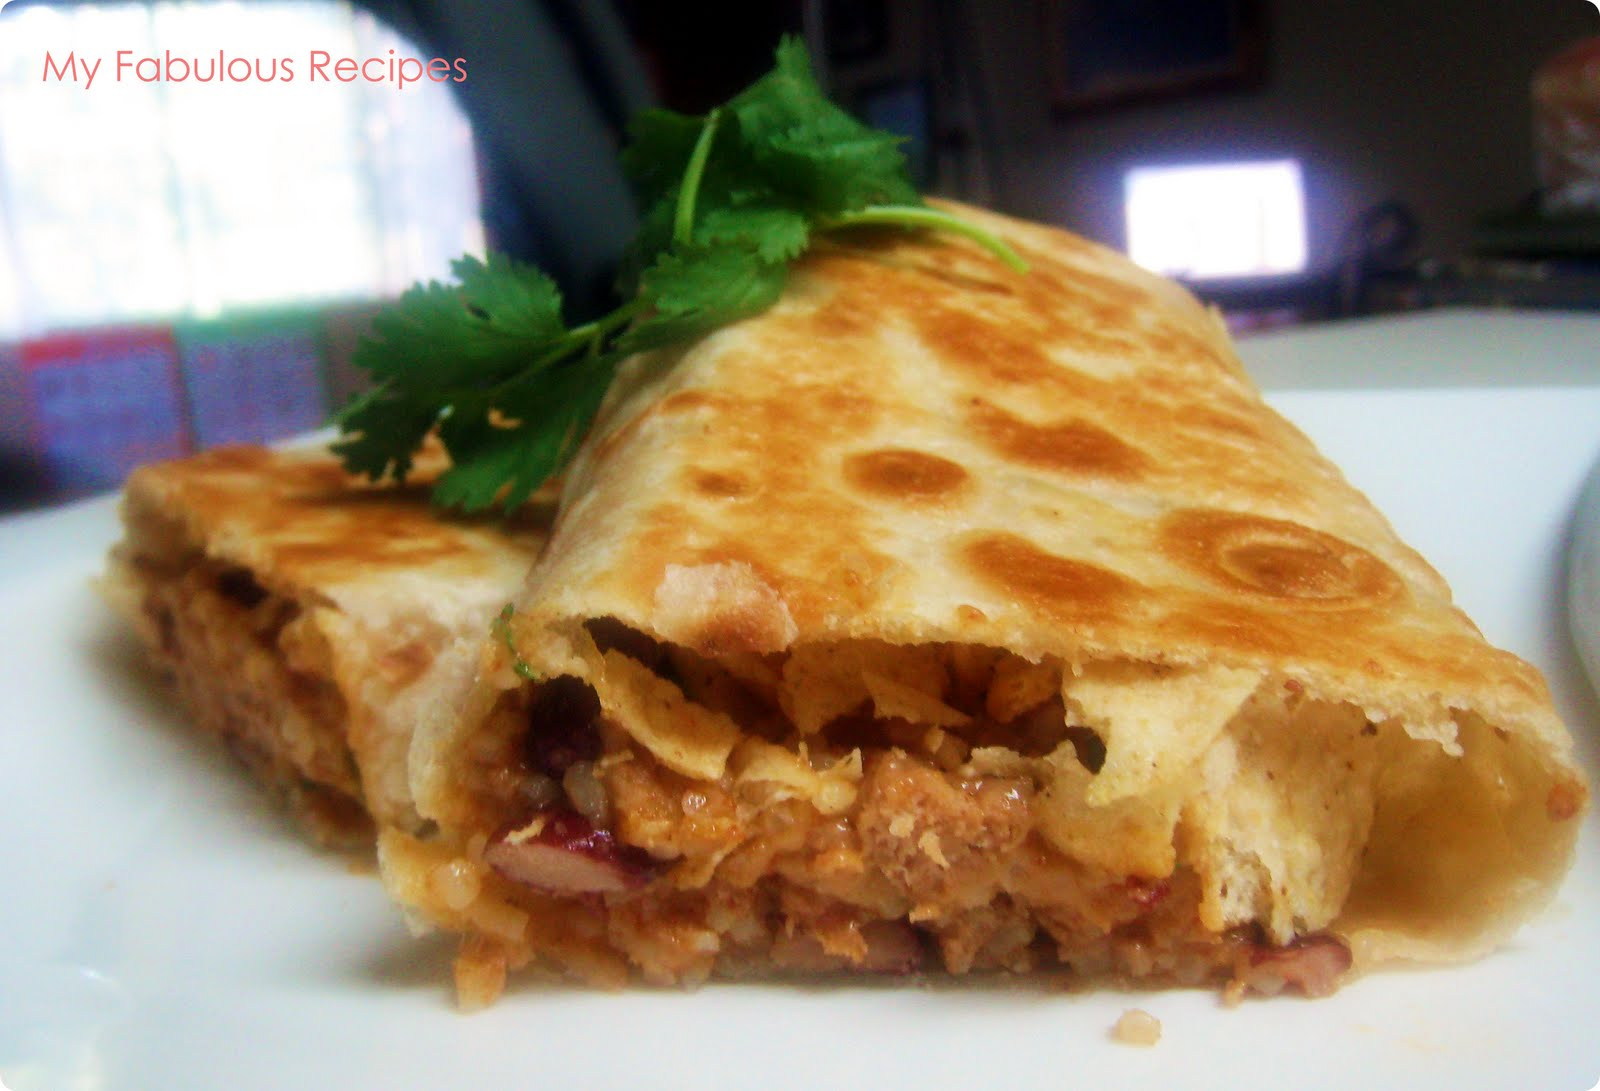 Backup: Crispy Chicken and Rice Burrito